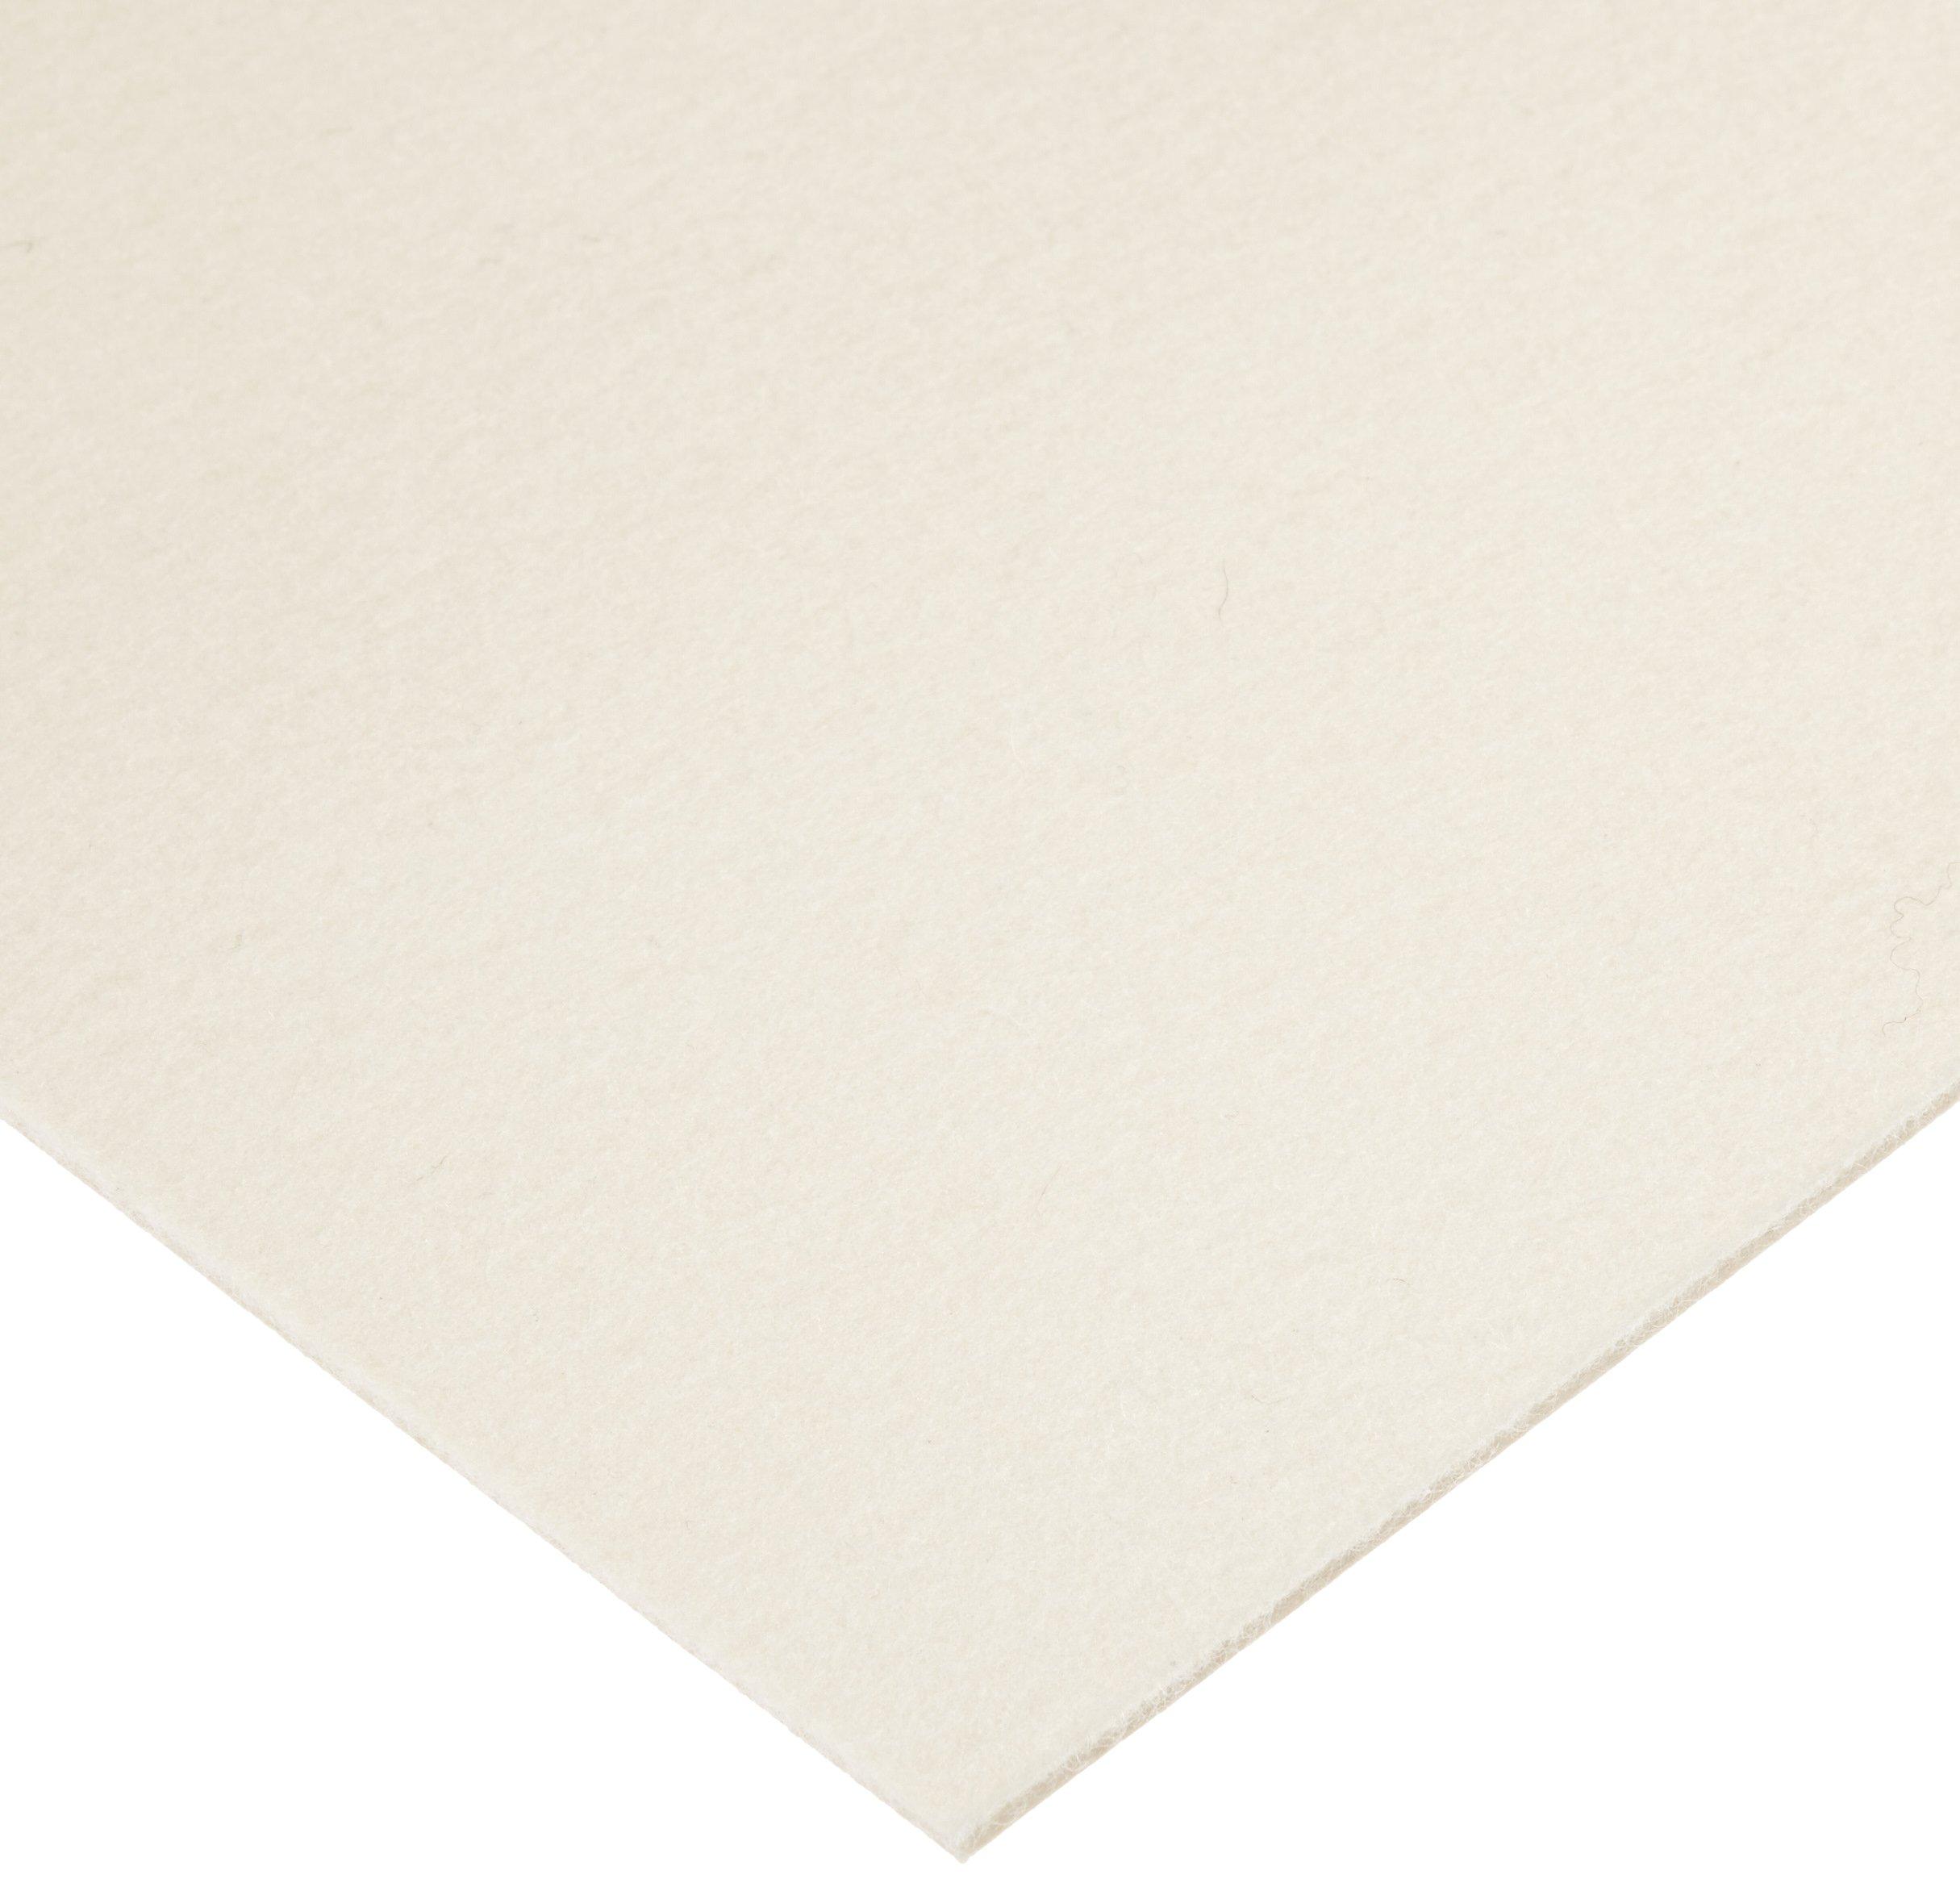 Grade S2-32 Pressed Wool Felt Sheet, White